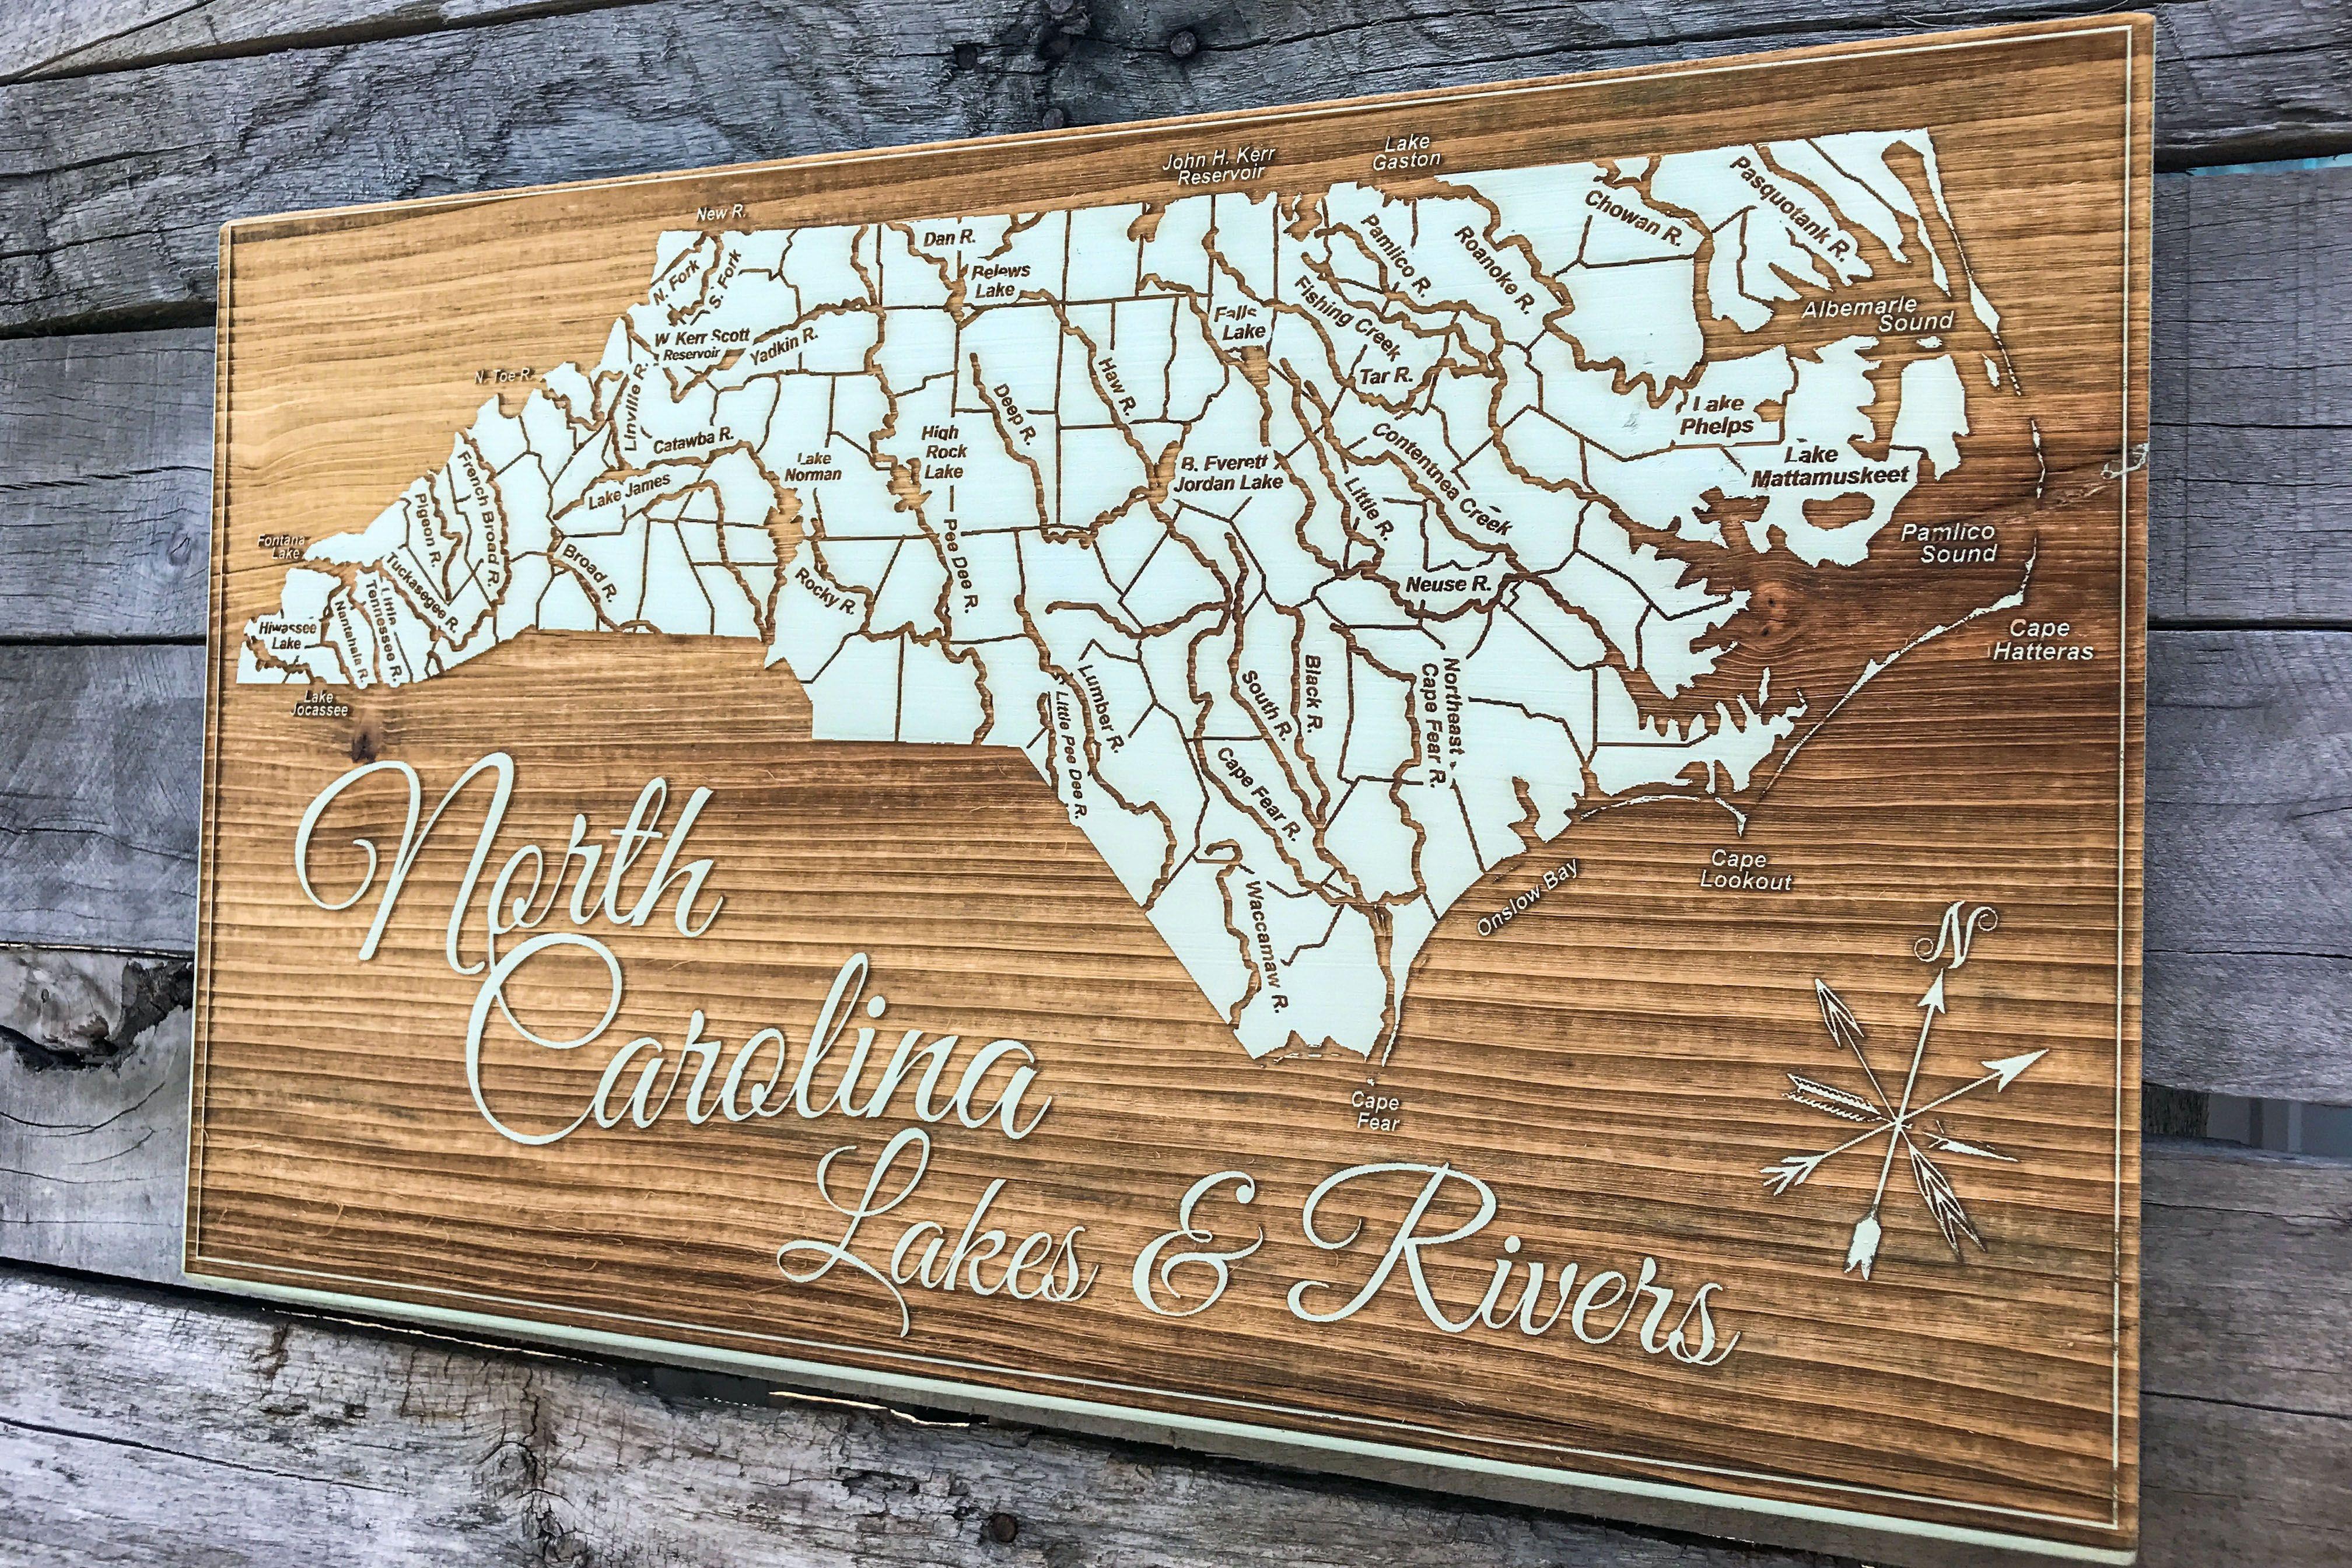 North Carolina Lakes and Rivers Map in